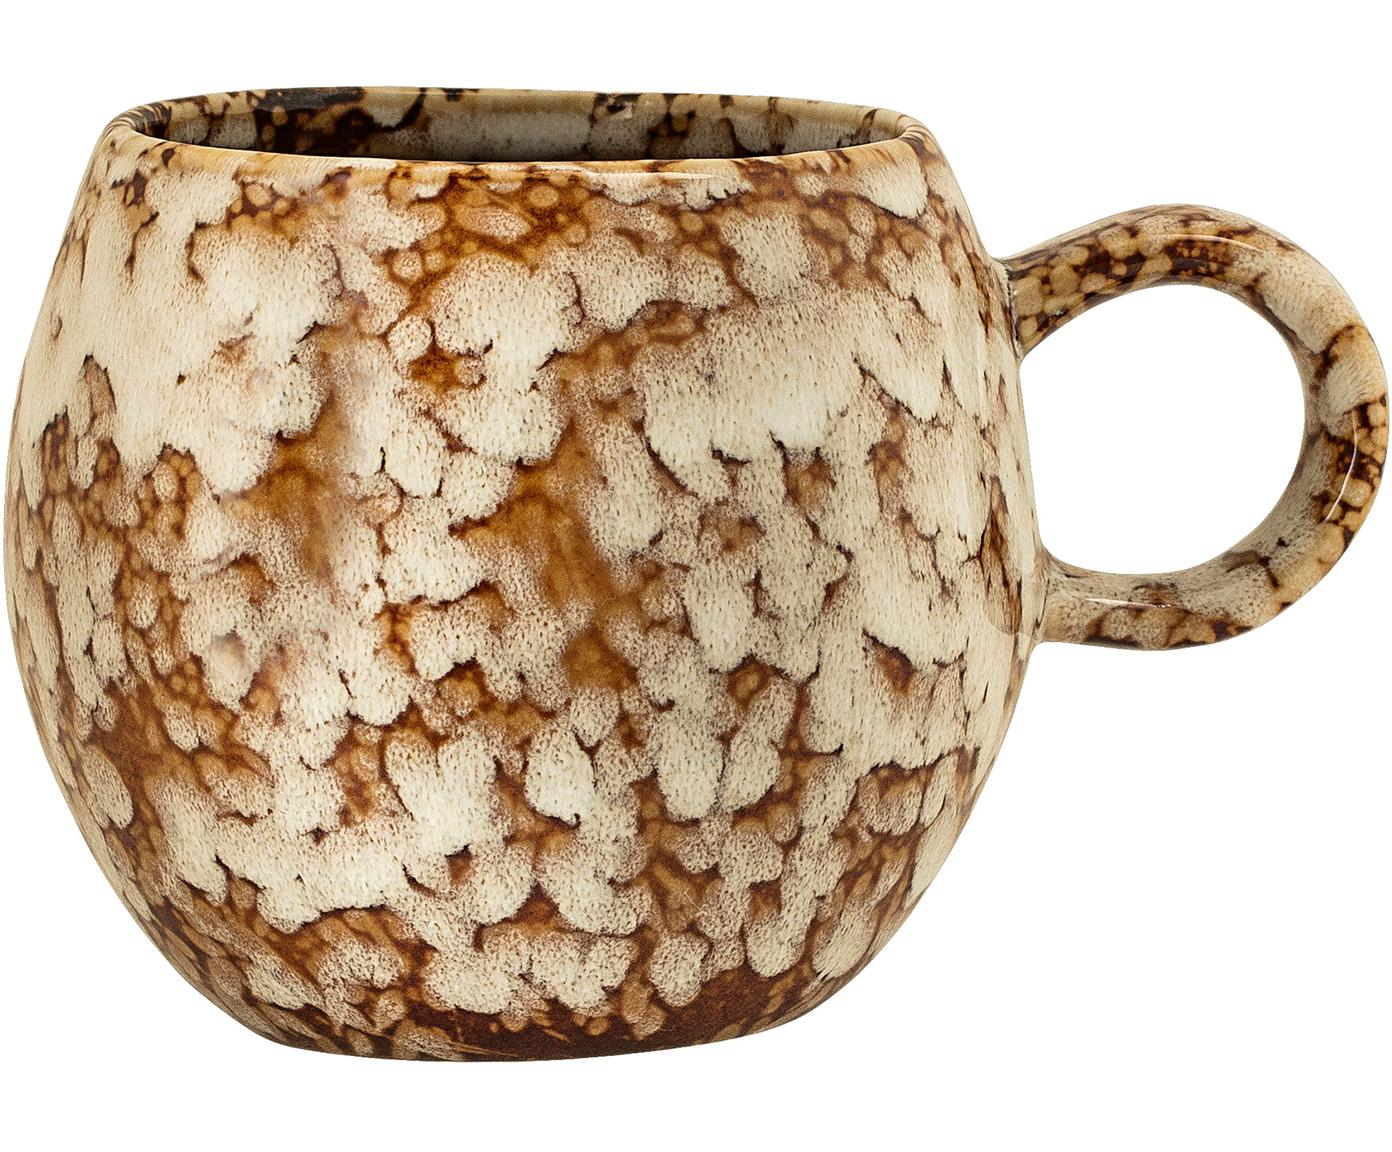 Tasse Paula, Steingut, Braun, Cremeweiss, Ø 9 x H 8 cm